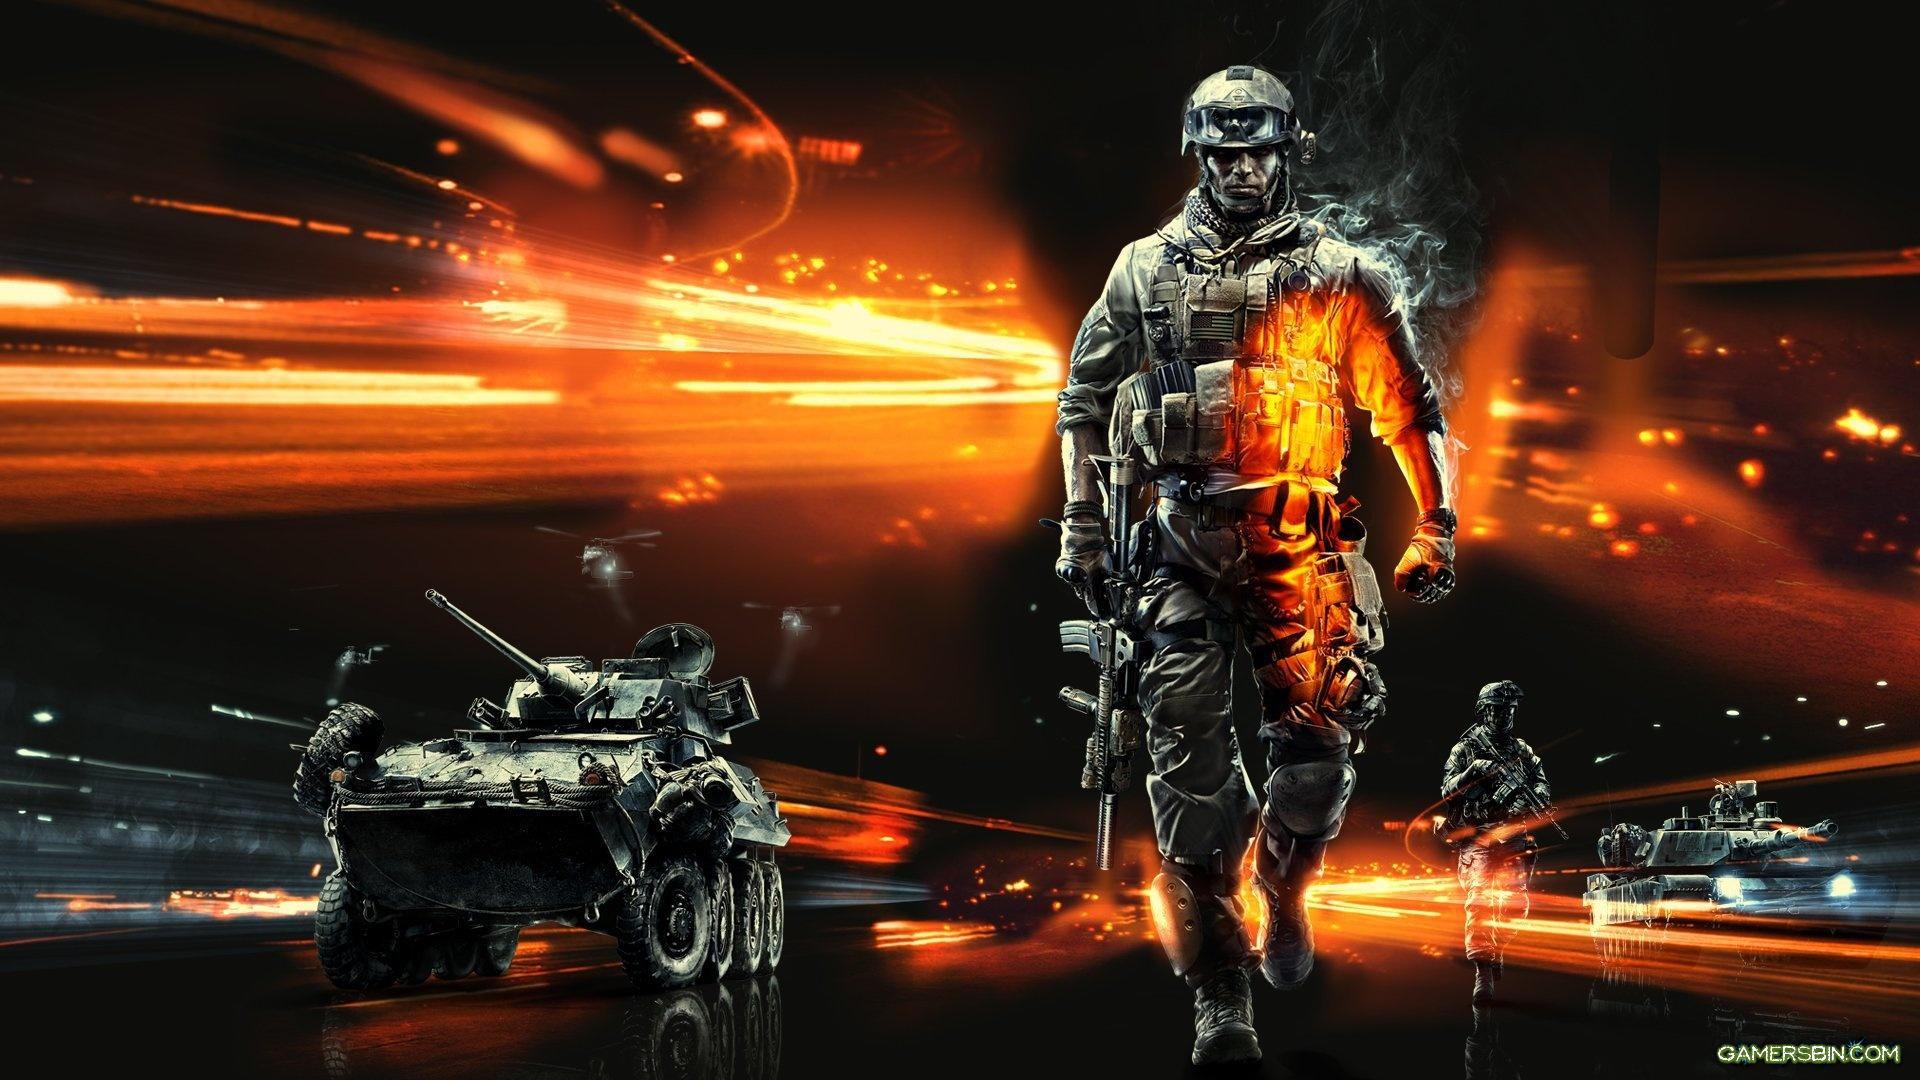 75906 Battlefield 3 Wallpaper HD soldiers armsjpg 1920x1080